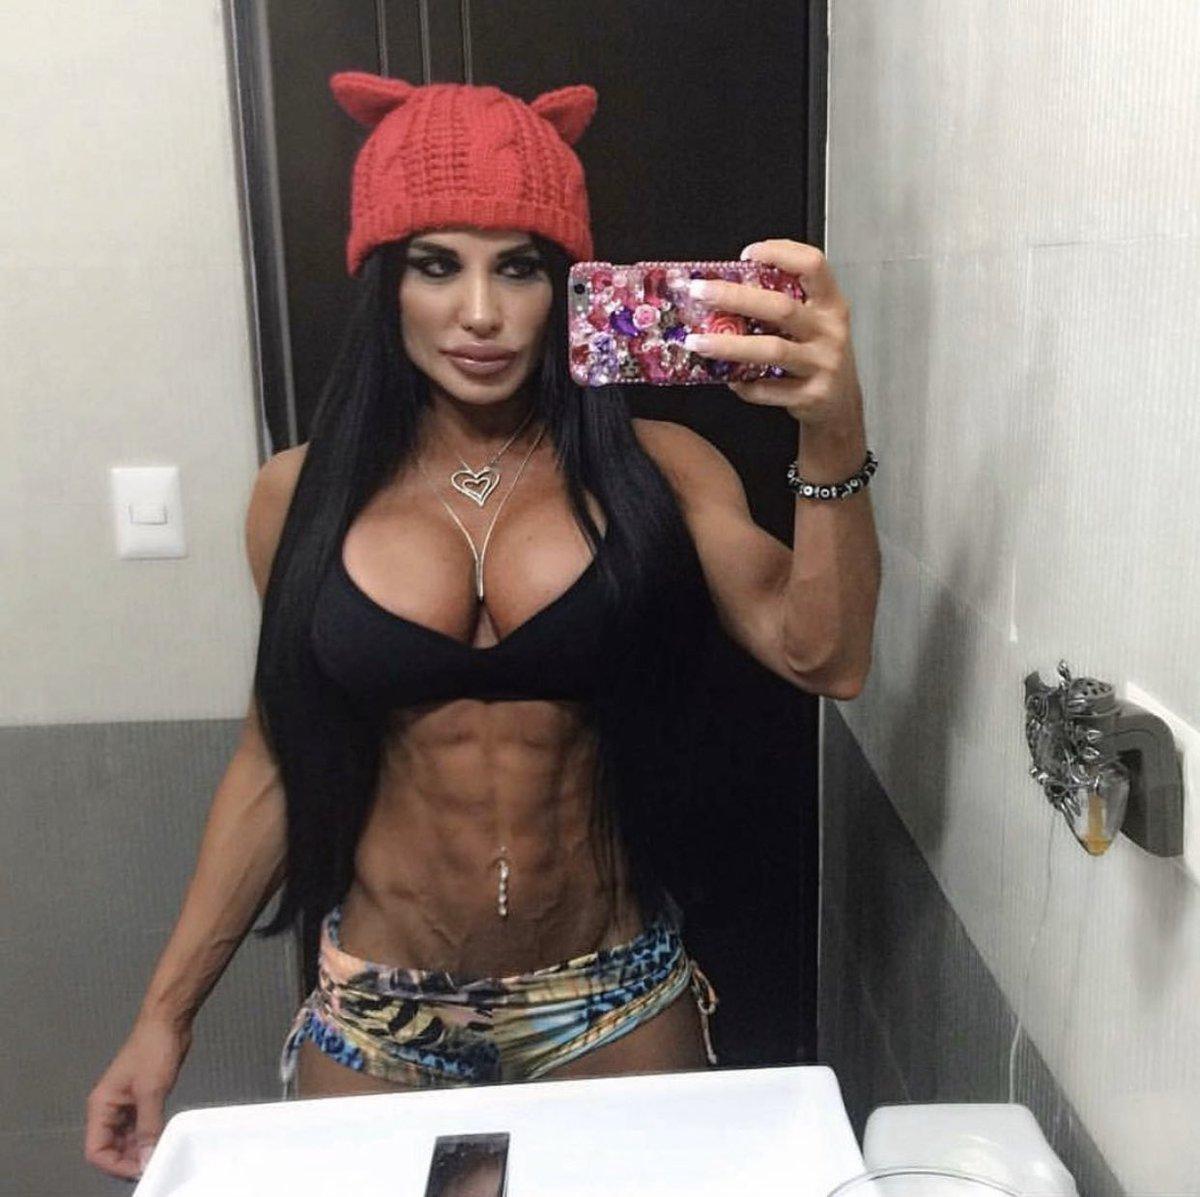 9 lives...just like a cat!  _________________ #fitfam #fitspo #fitness #exercise #model #movies #sexy #fitnessmodel #hardbody #girlswithmuscle #girlswholift #followme #follow #picoftheday #beauty #babesofinsta #sexygymbabes  #model #sexy #vascular #fitnessmotivation #hardbodypic.twitter.com/AtJLOgRbtt